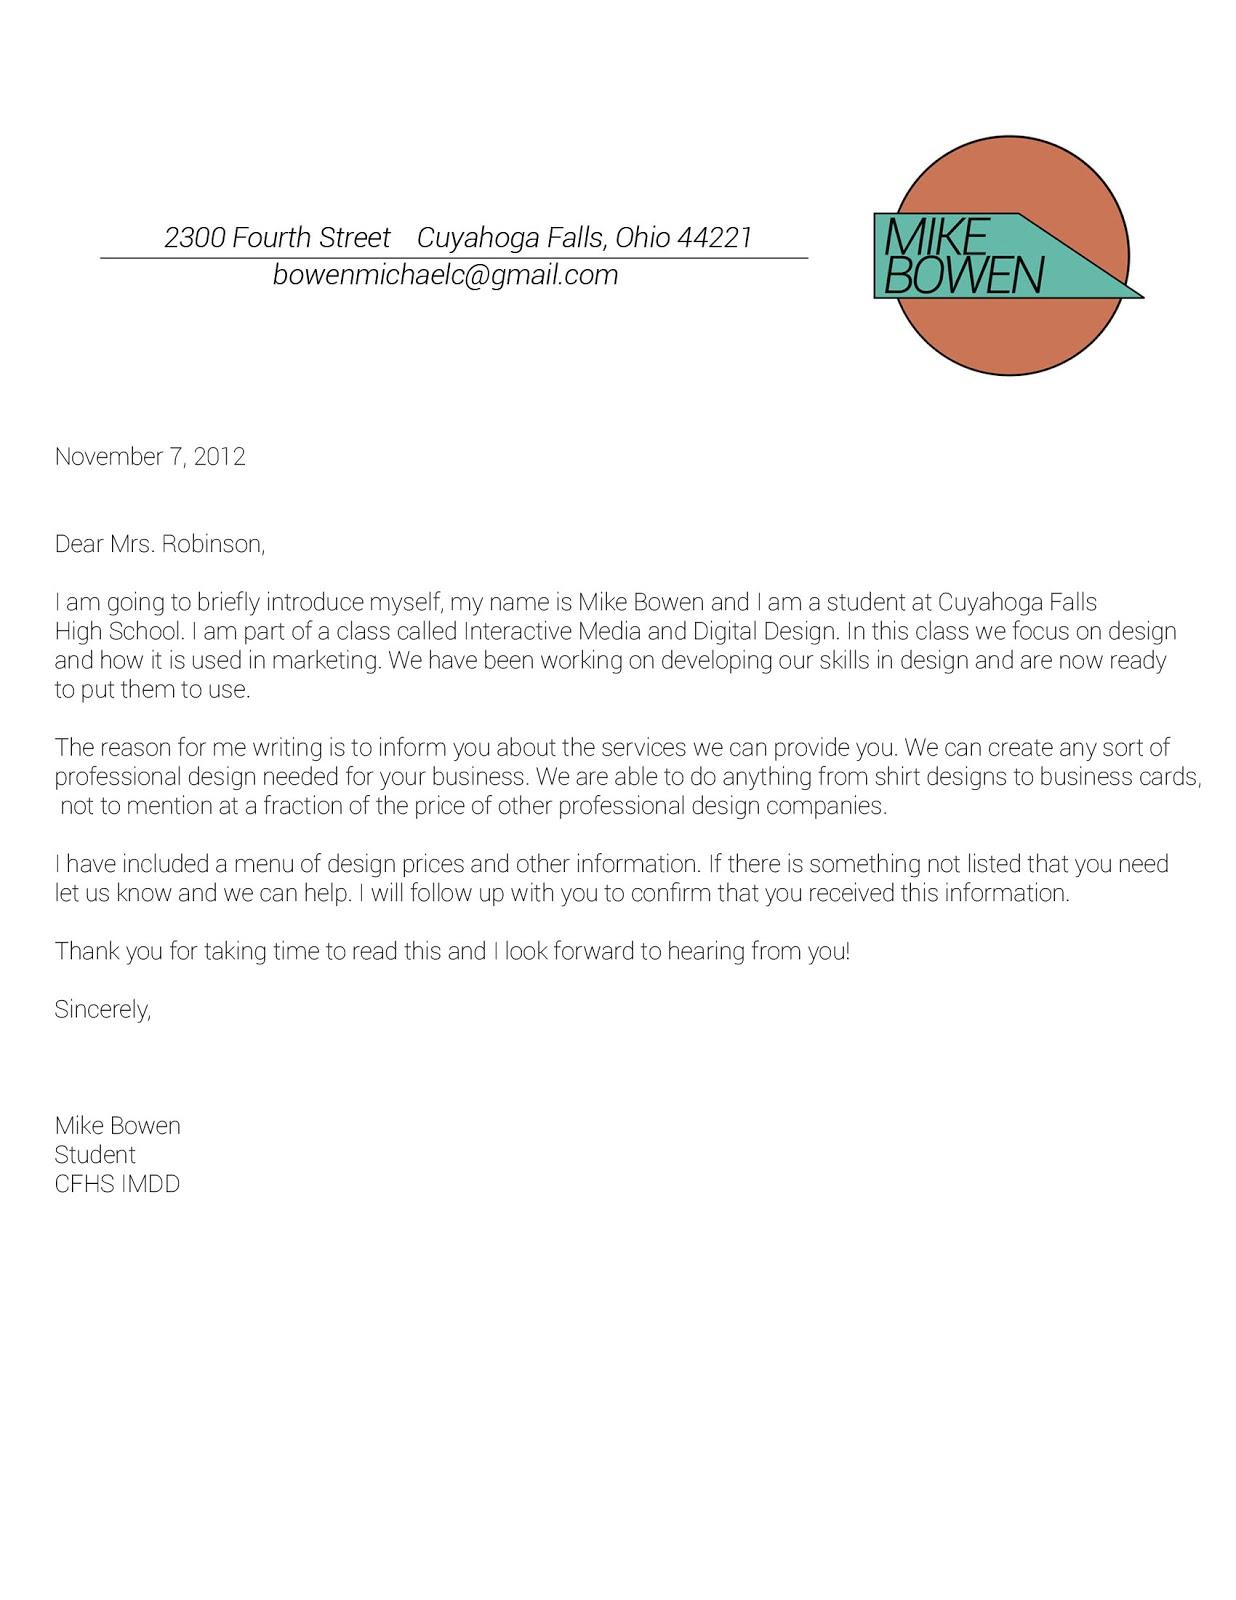 Customize 833+ letterhead templates online canva.